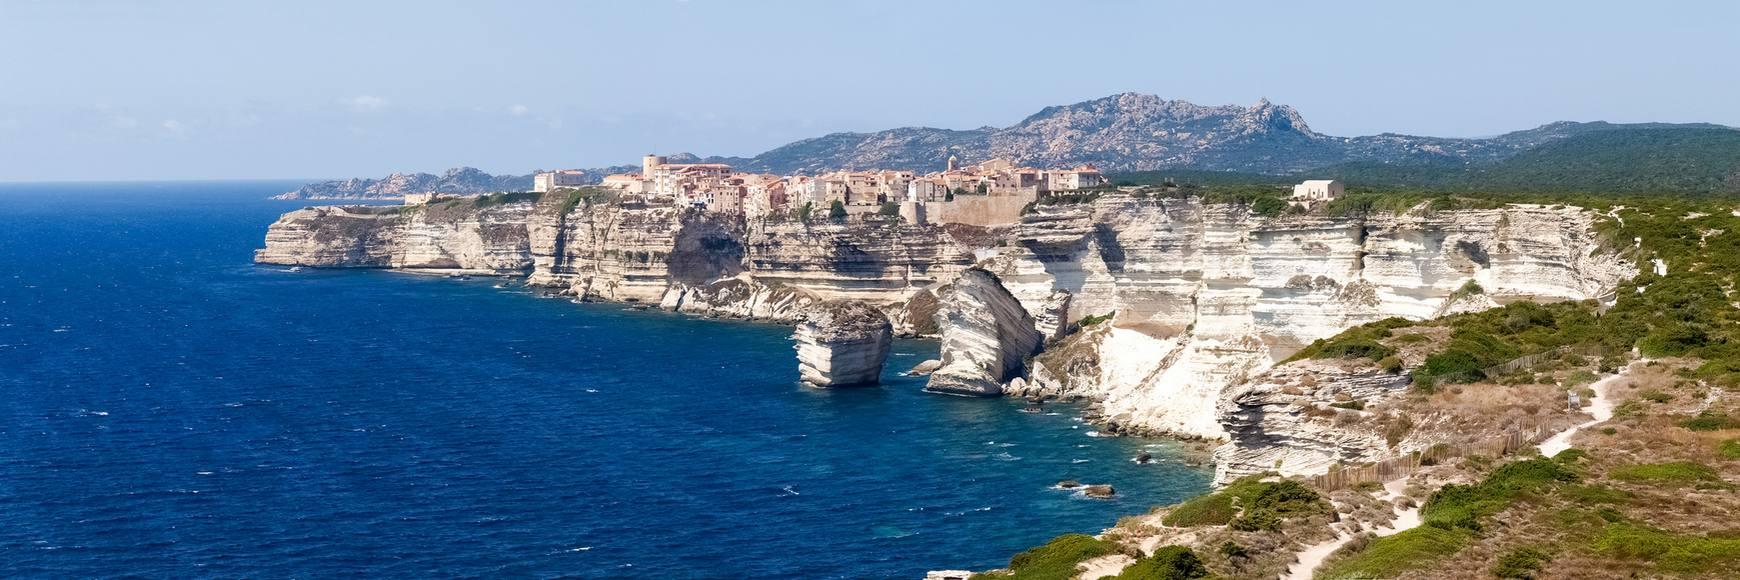 Location catamaran Corse